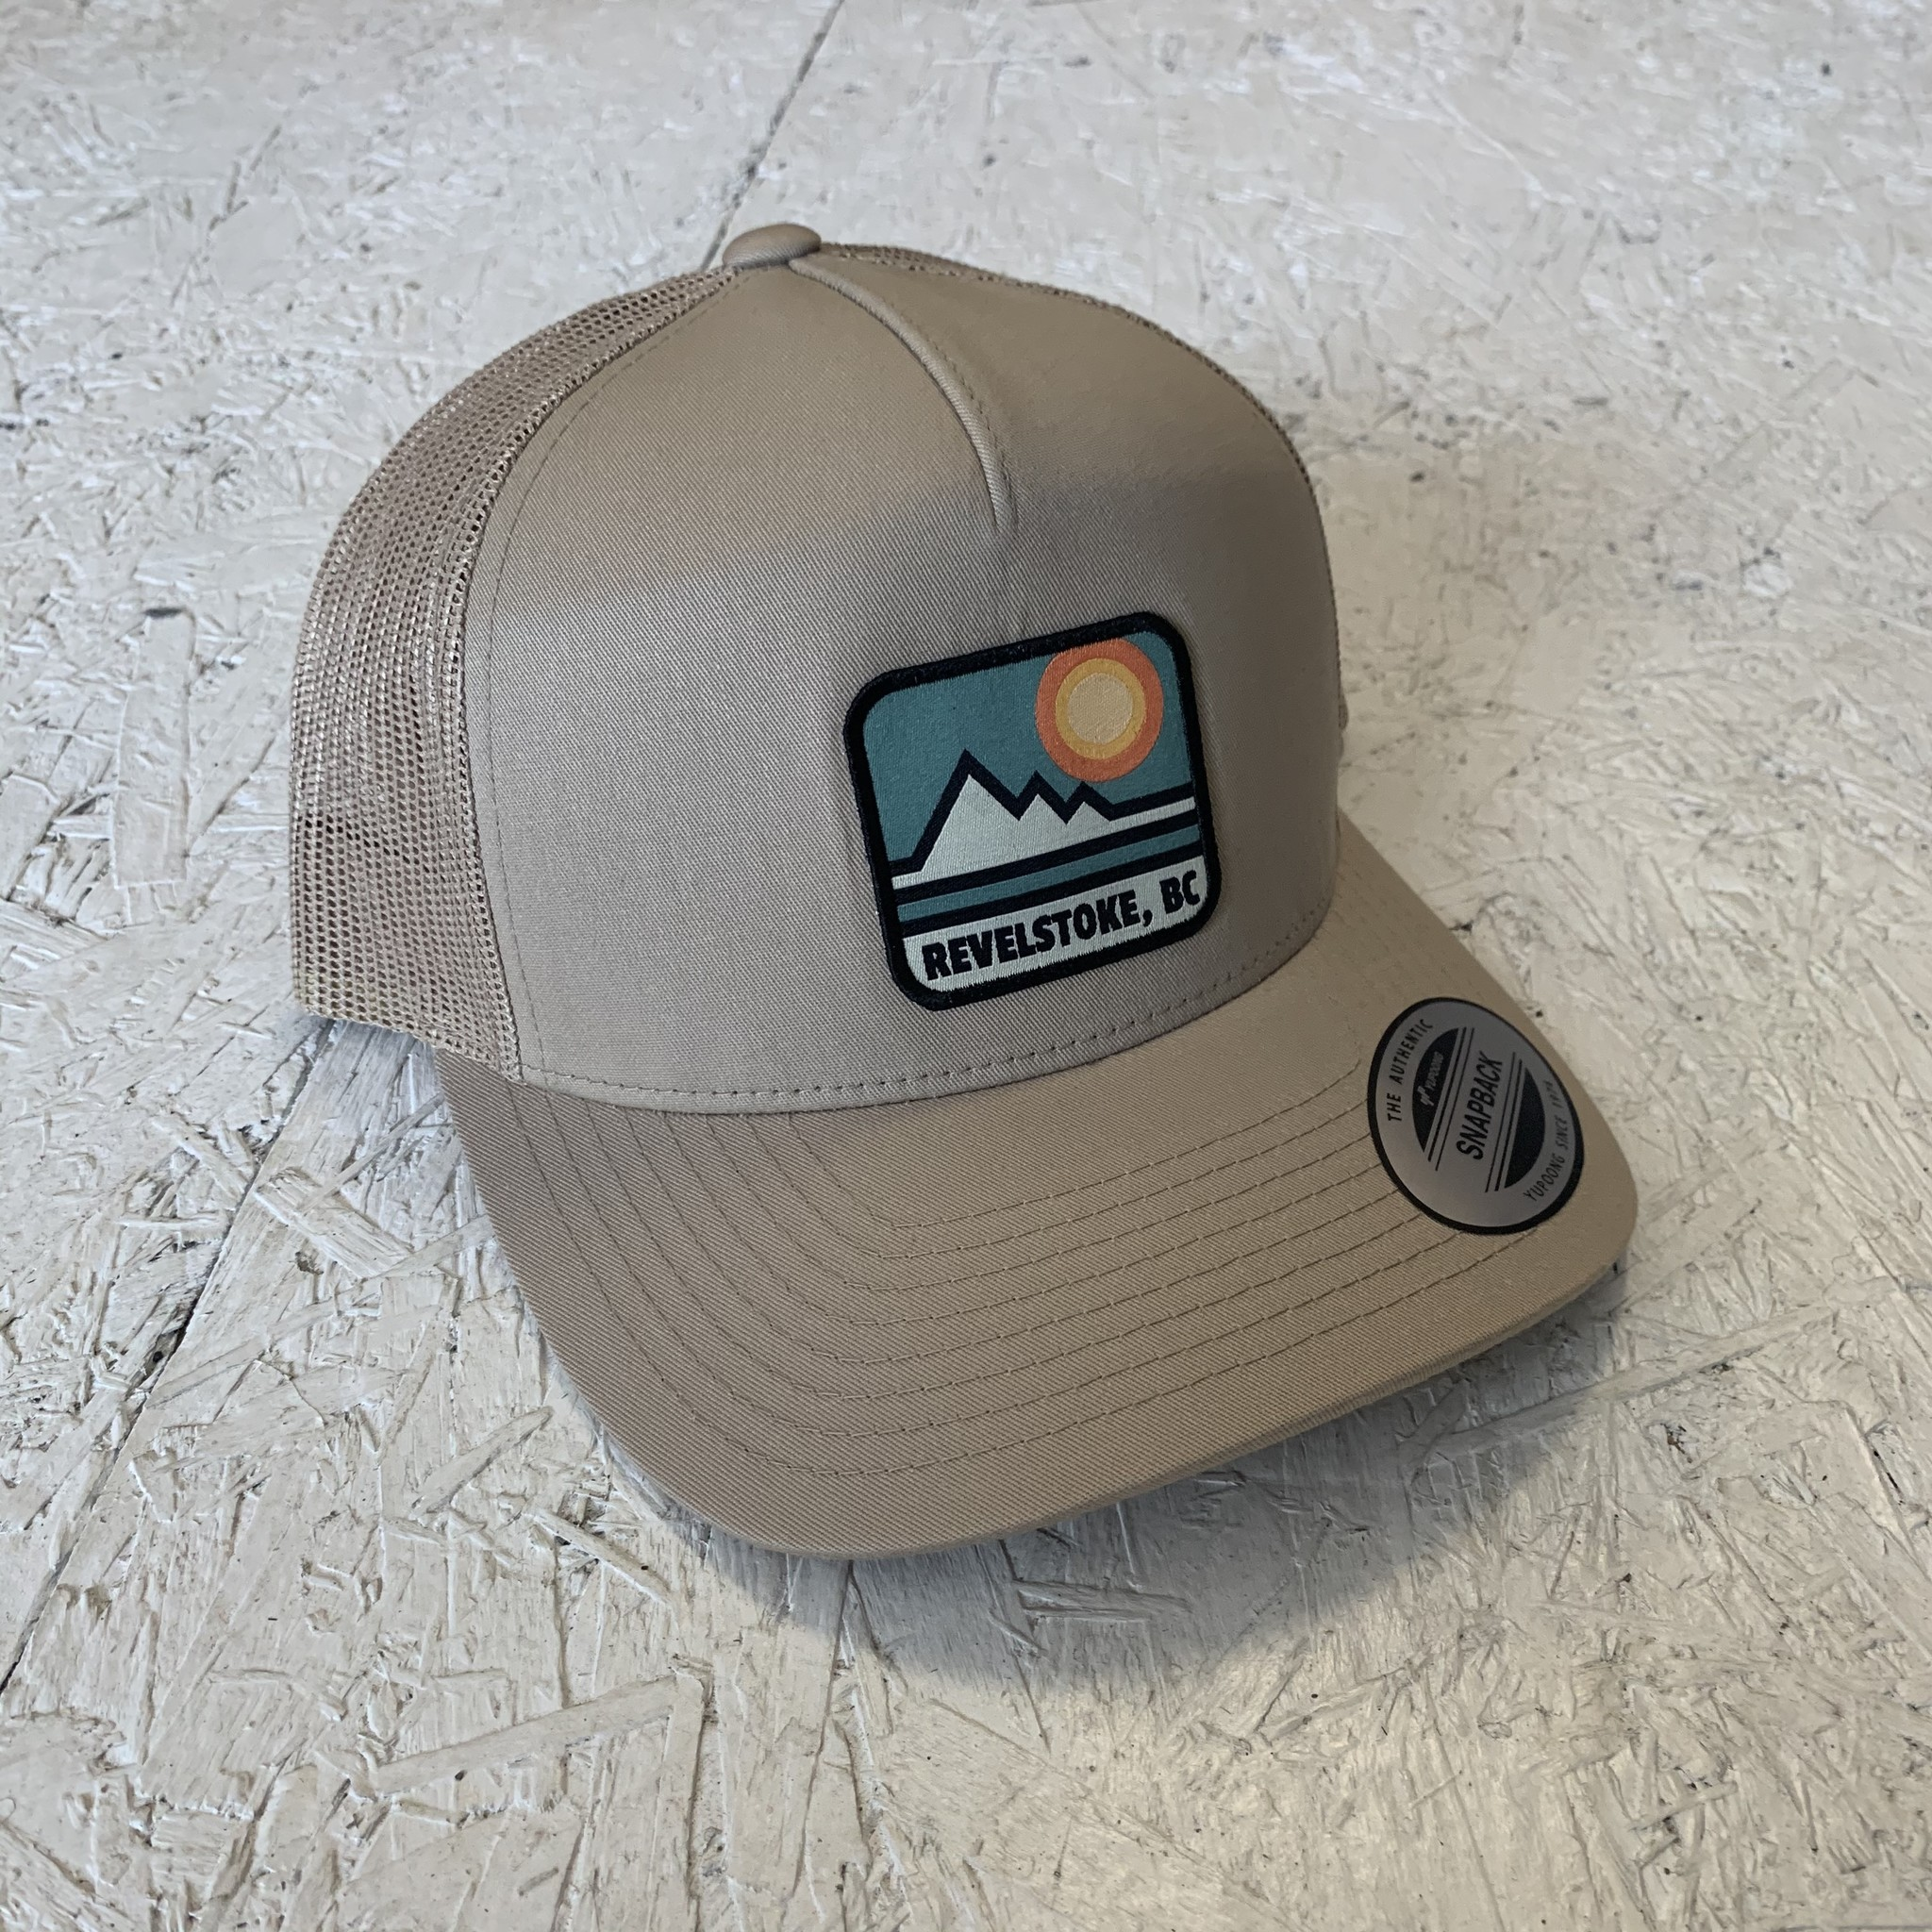 Revelstoke Trading Post Revelstoke - Retro Patch Curve Trucker - Khaki